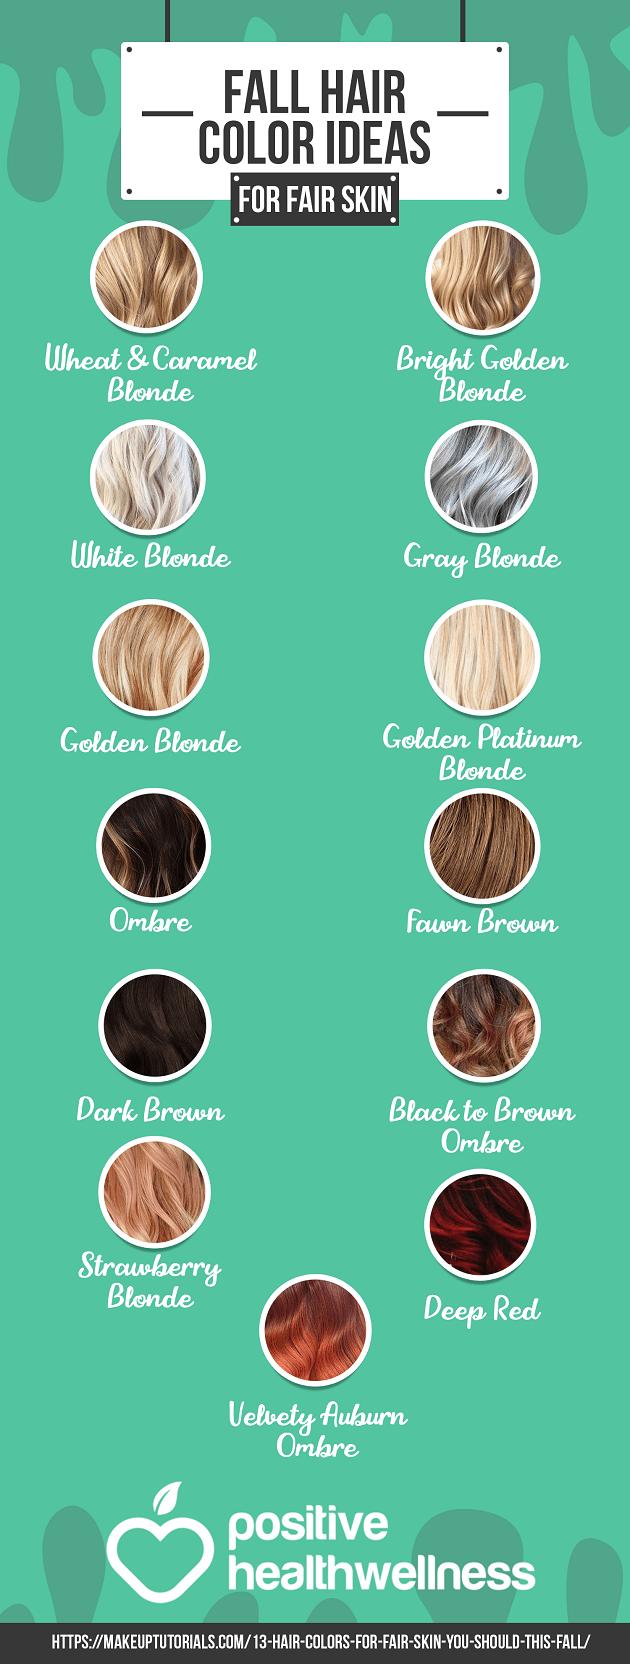 13 Fall Hair Color Ideas For Fair Skin